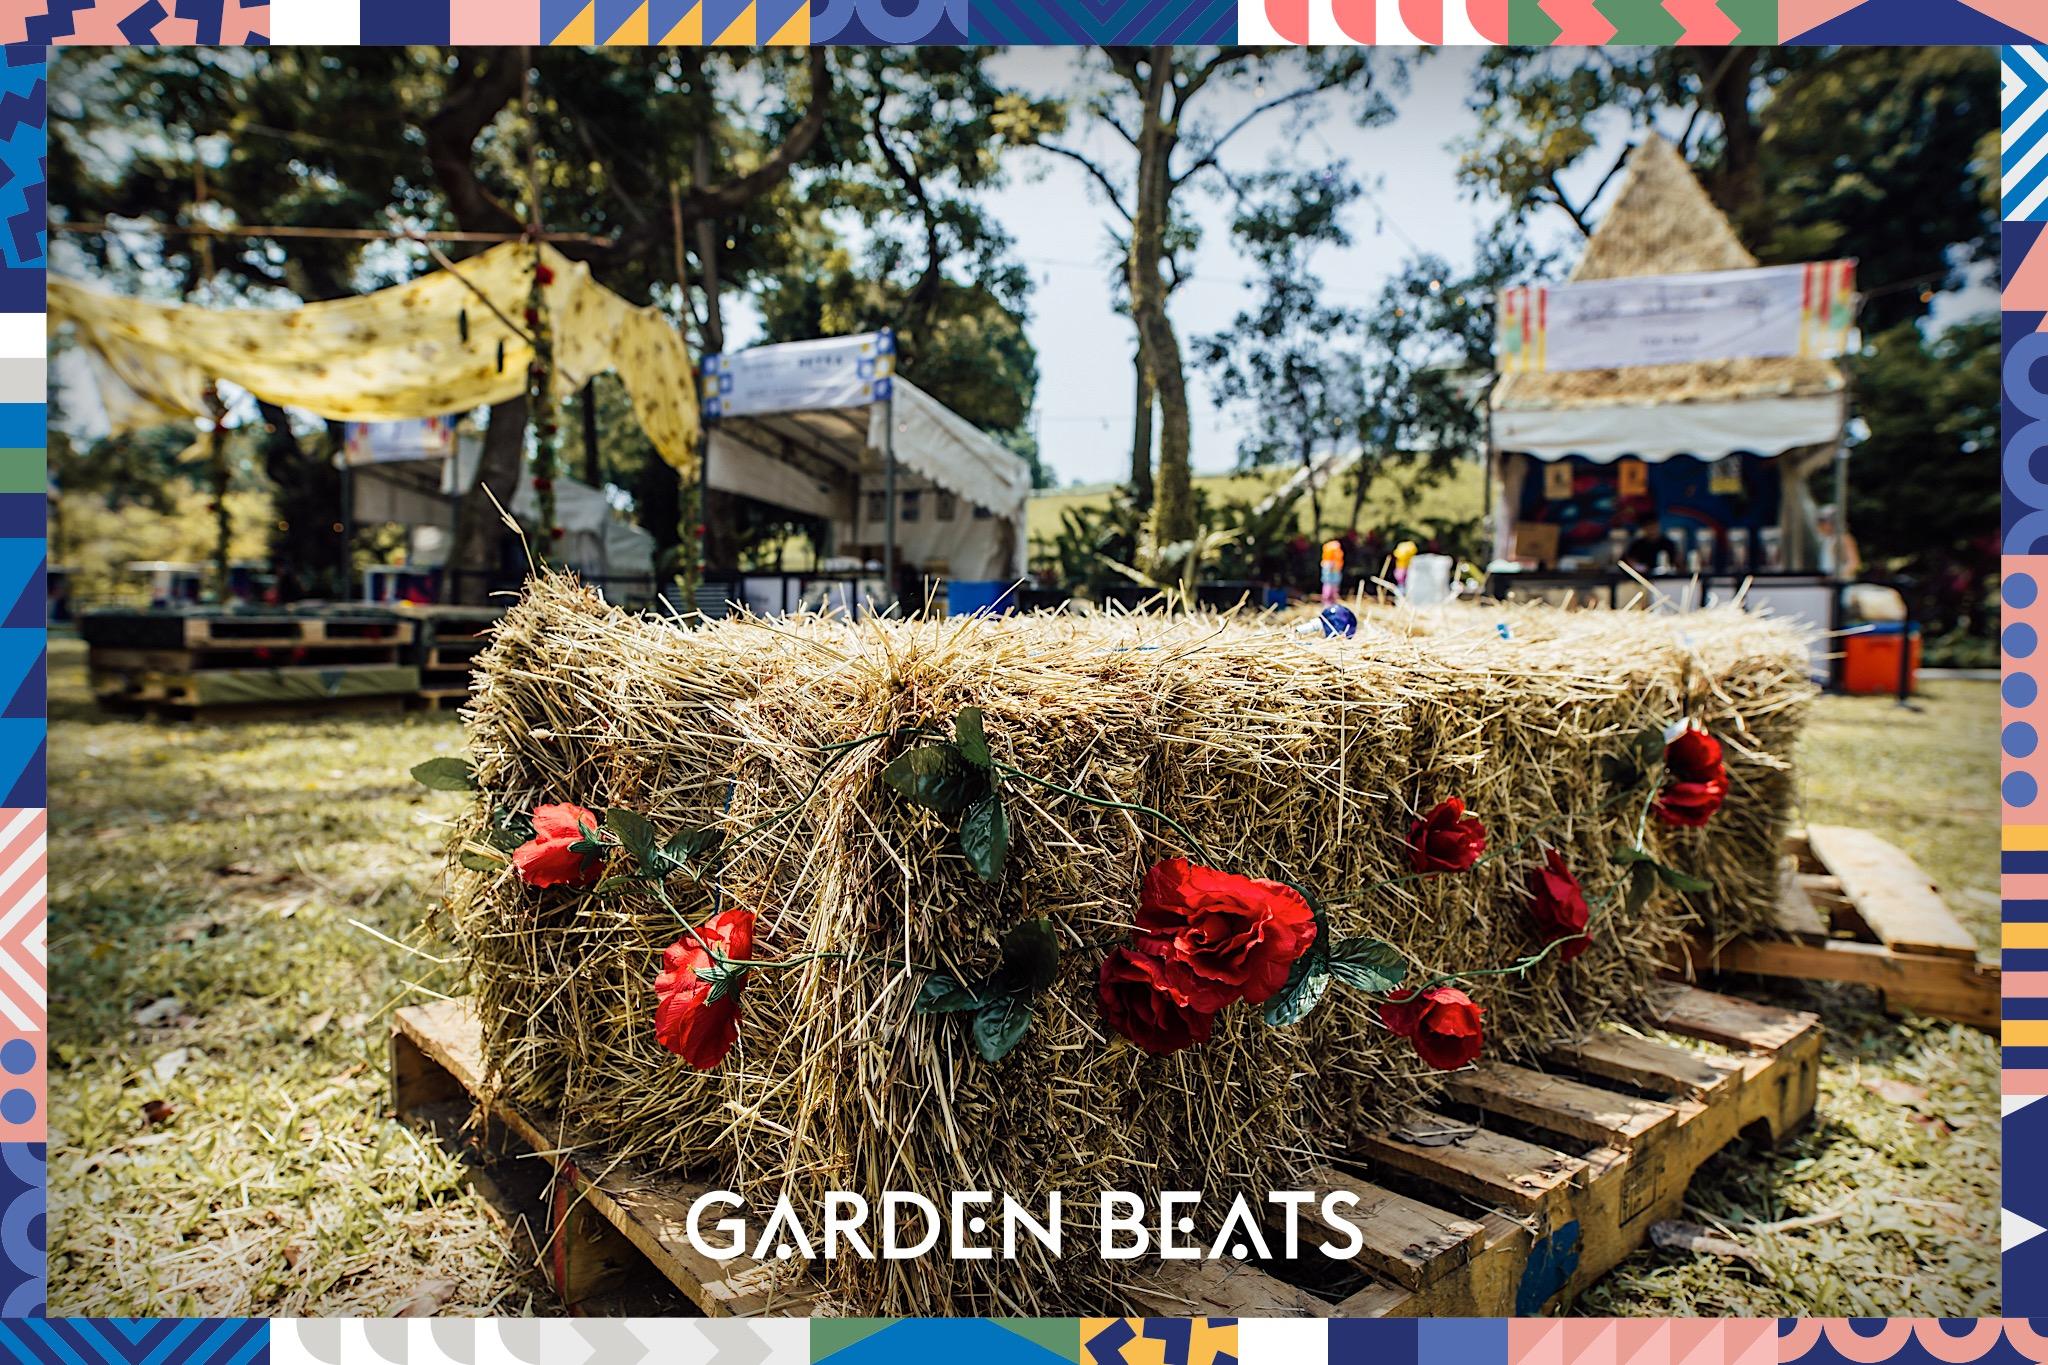 18032017_GardenBeats_Colossal005_WatermarkedGB.jpg